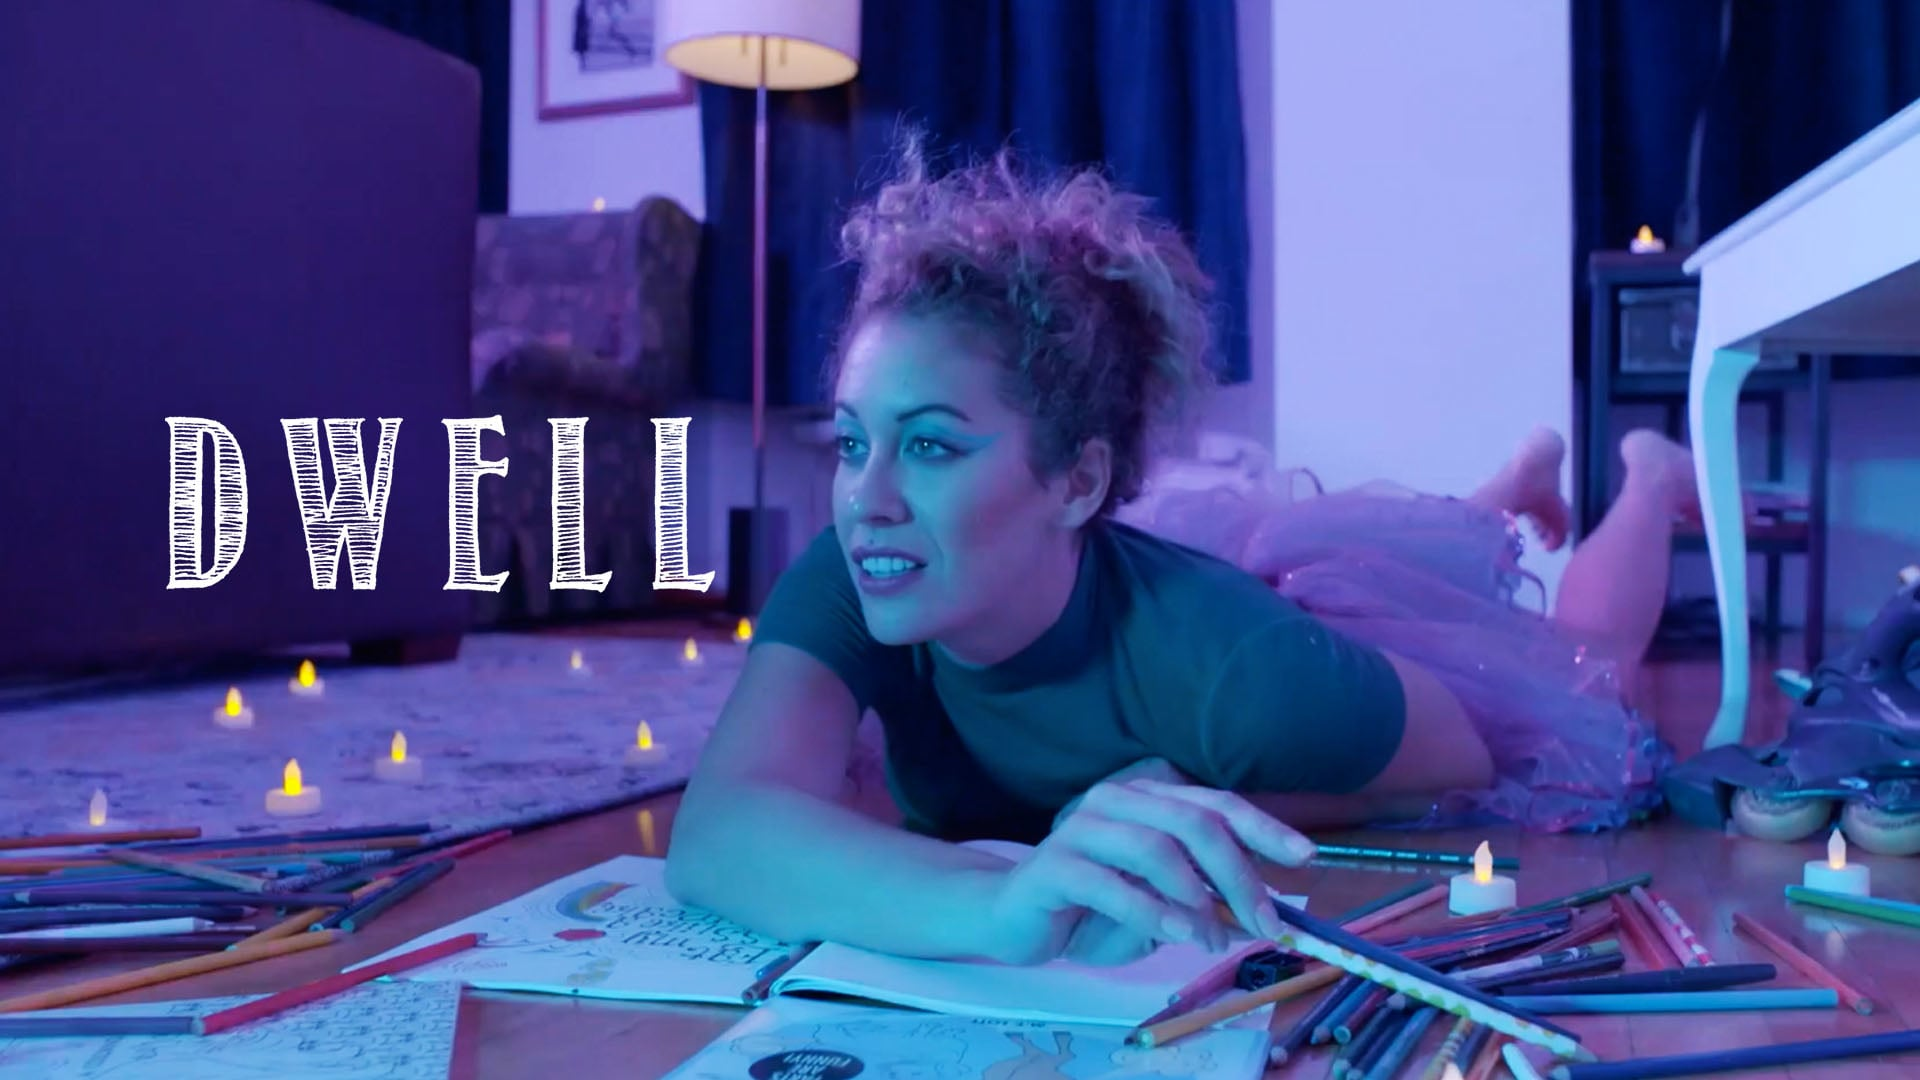 DWELL | Short Film